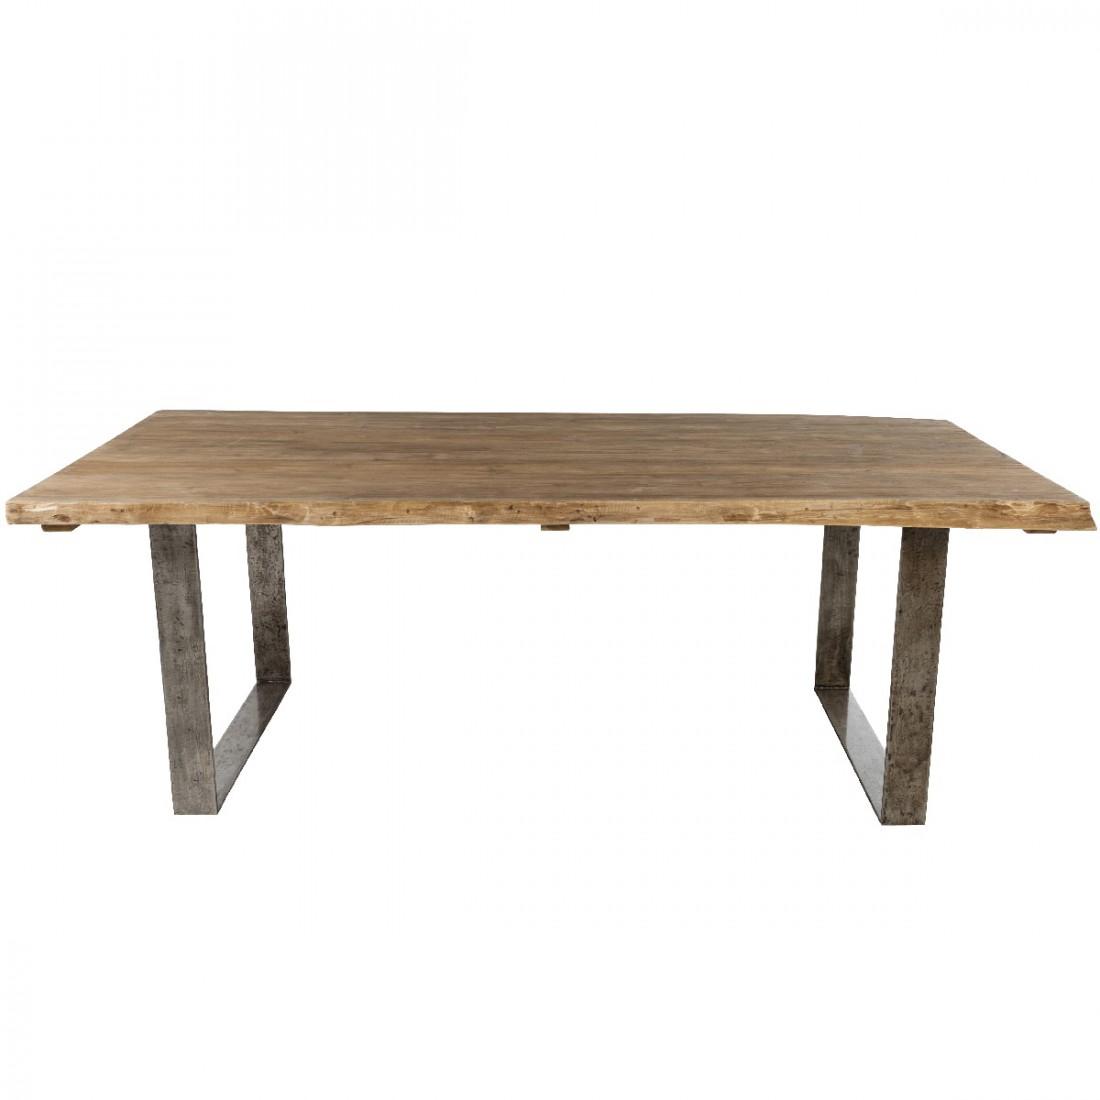 vague 220x100 teak table. Black Bedroom Furniture Sets. Home Design Ideas